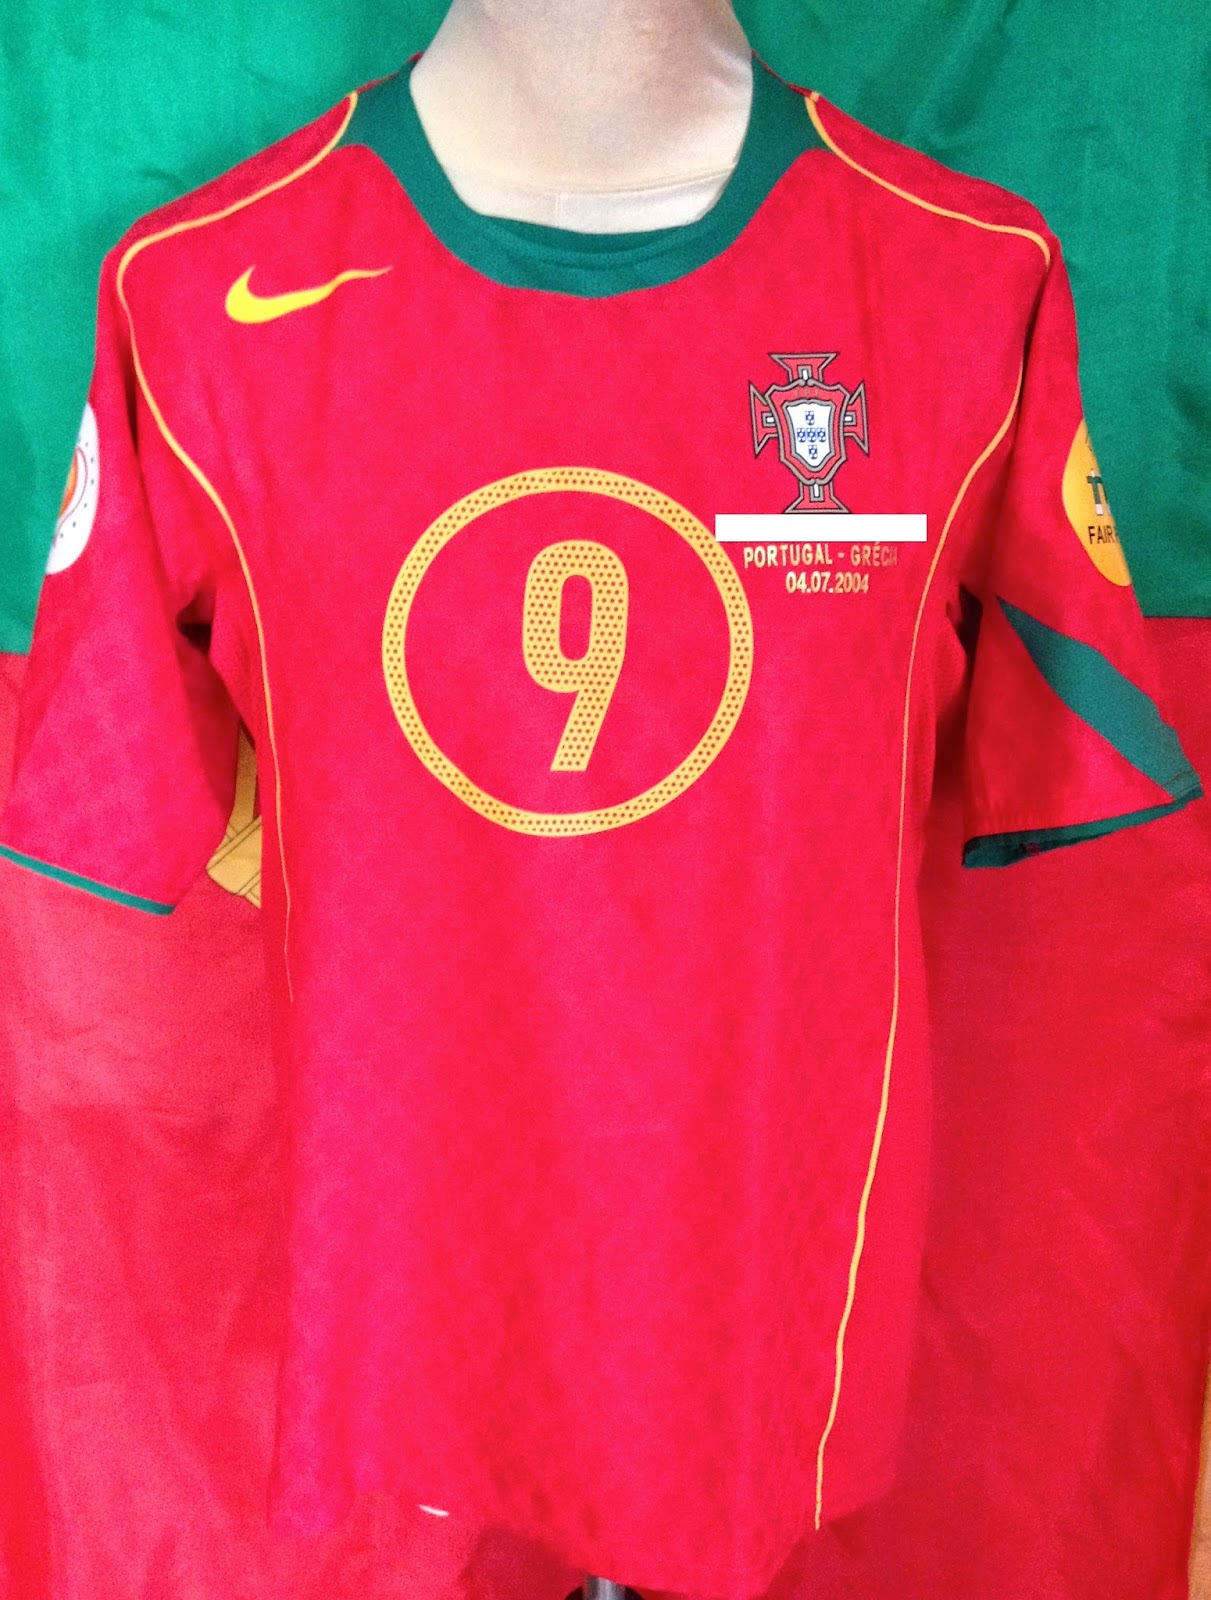 Match Worn Shirts FC Porto / Portugal: CAMISOLA DE JOGO